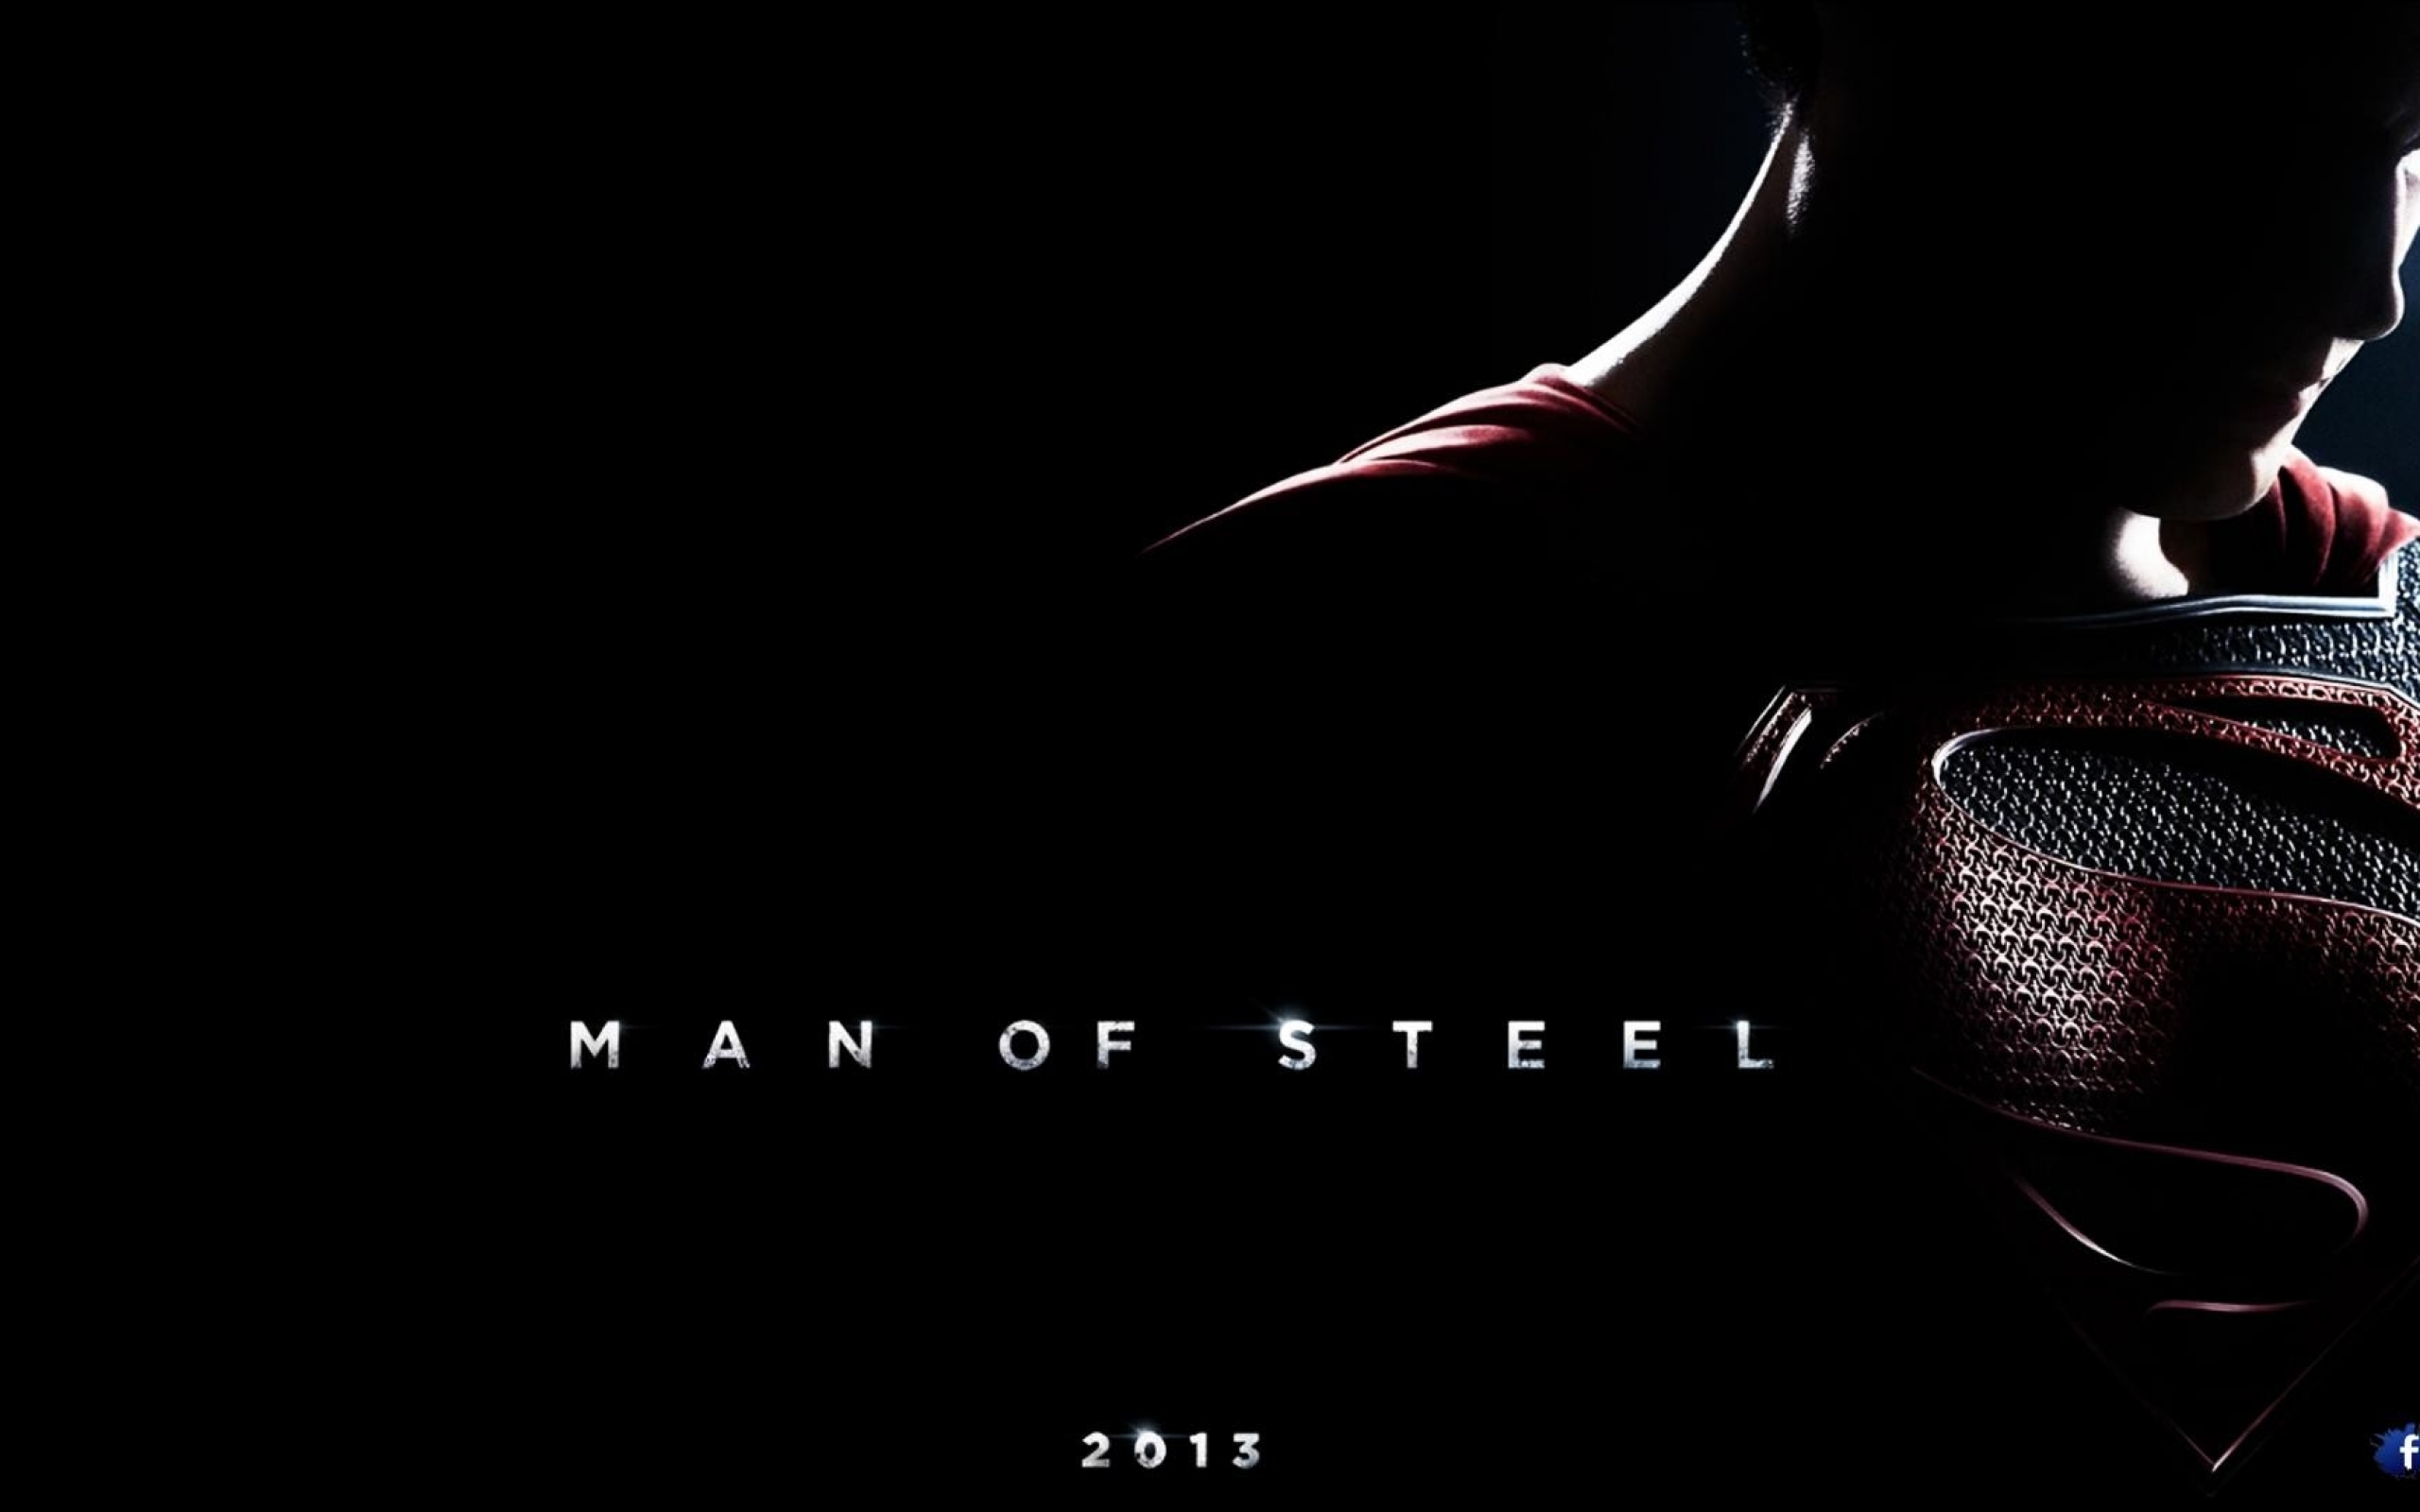 man of steel movie 1920x1080 wallpaper High Resolution WallpaperHi 2560x1600